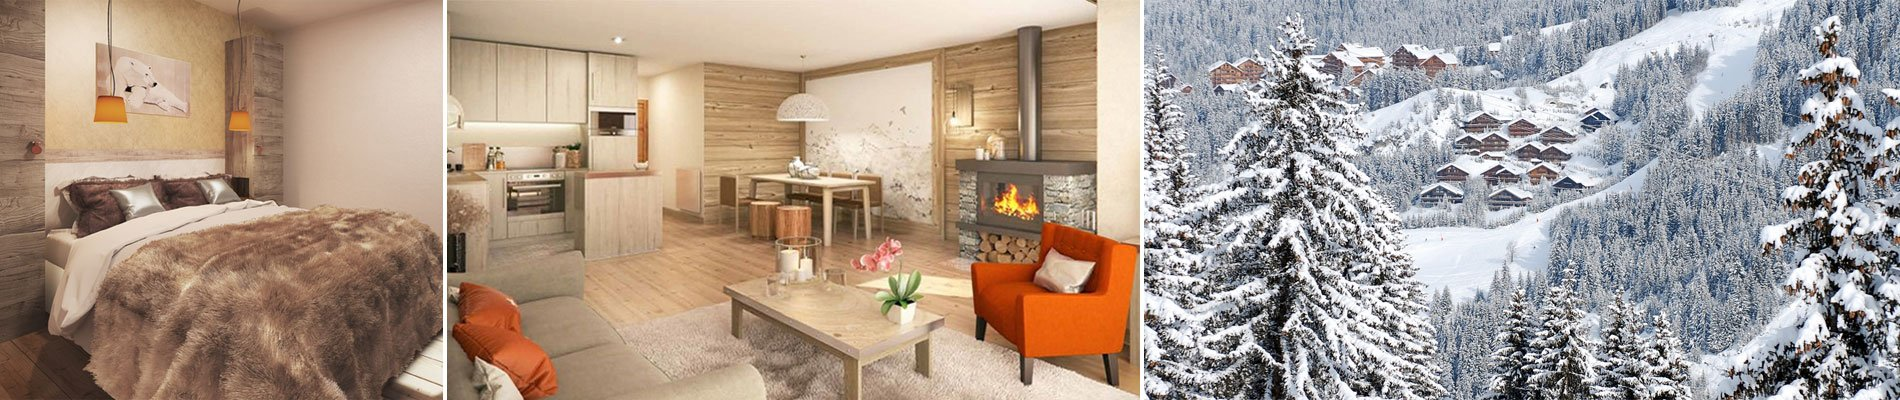 meribel-residence-wintersport-hevana-pierre-et-vacances